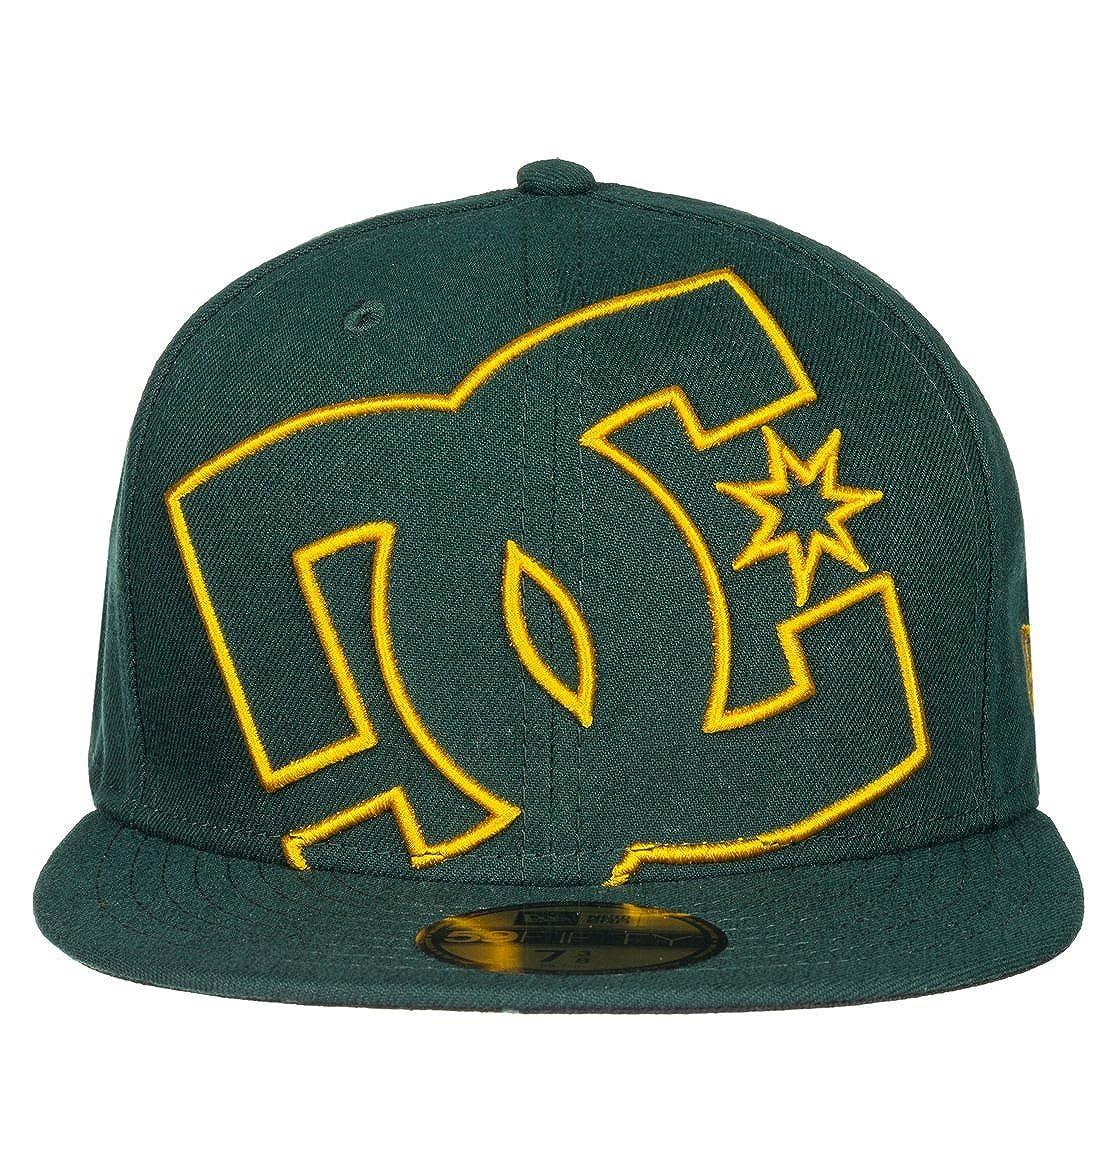 73952a36 Amazon.com: DC Men's Coverage II New Era Hat: Clothing